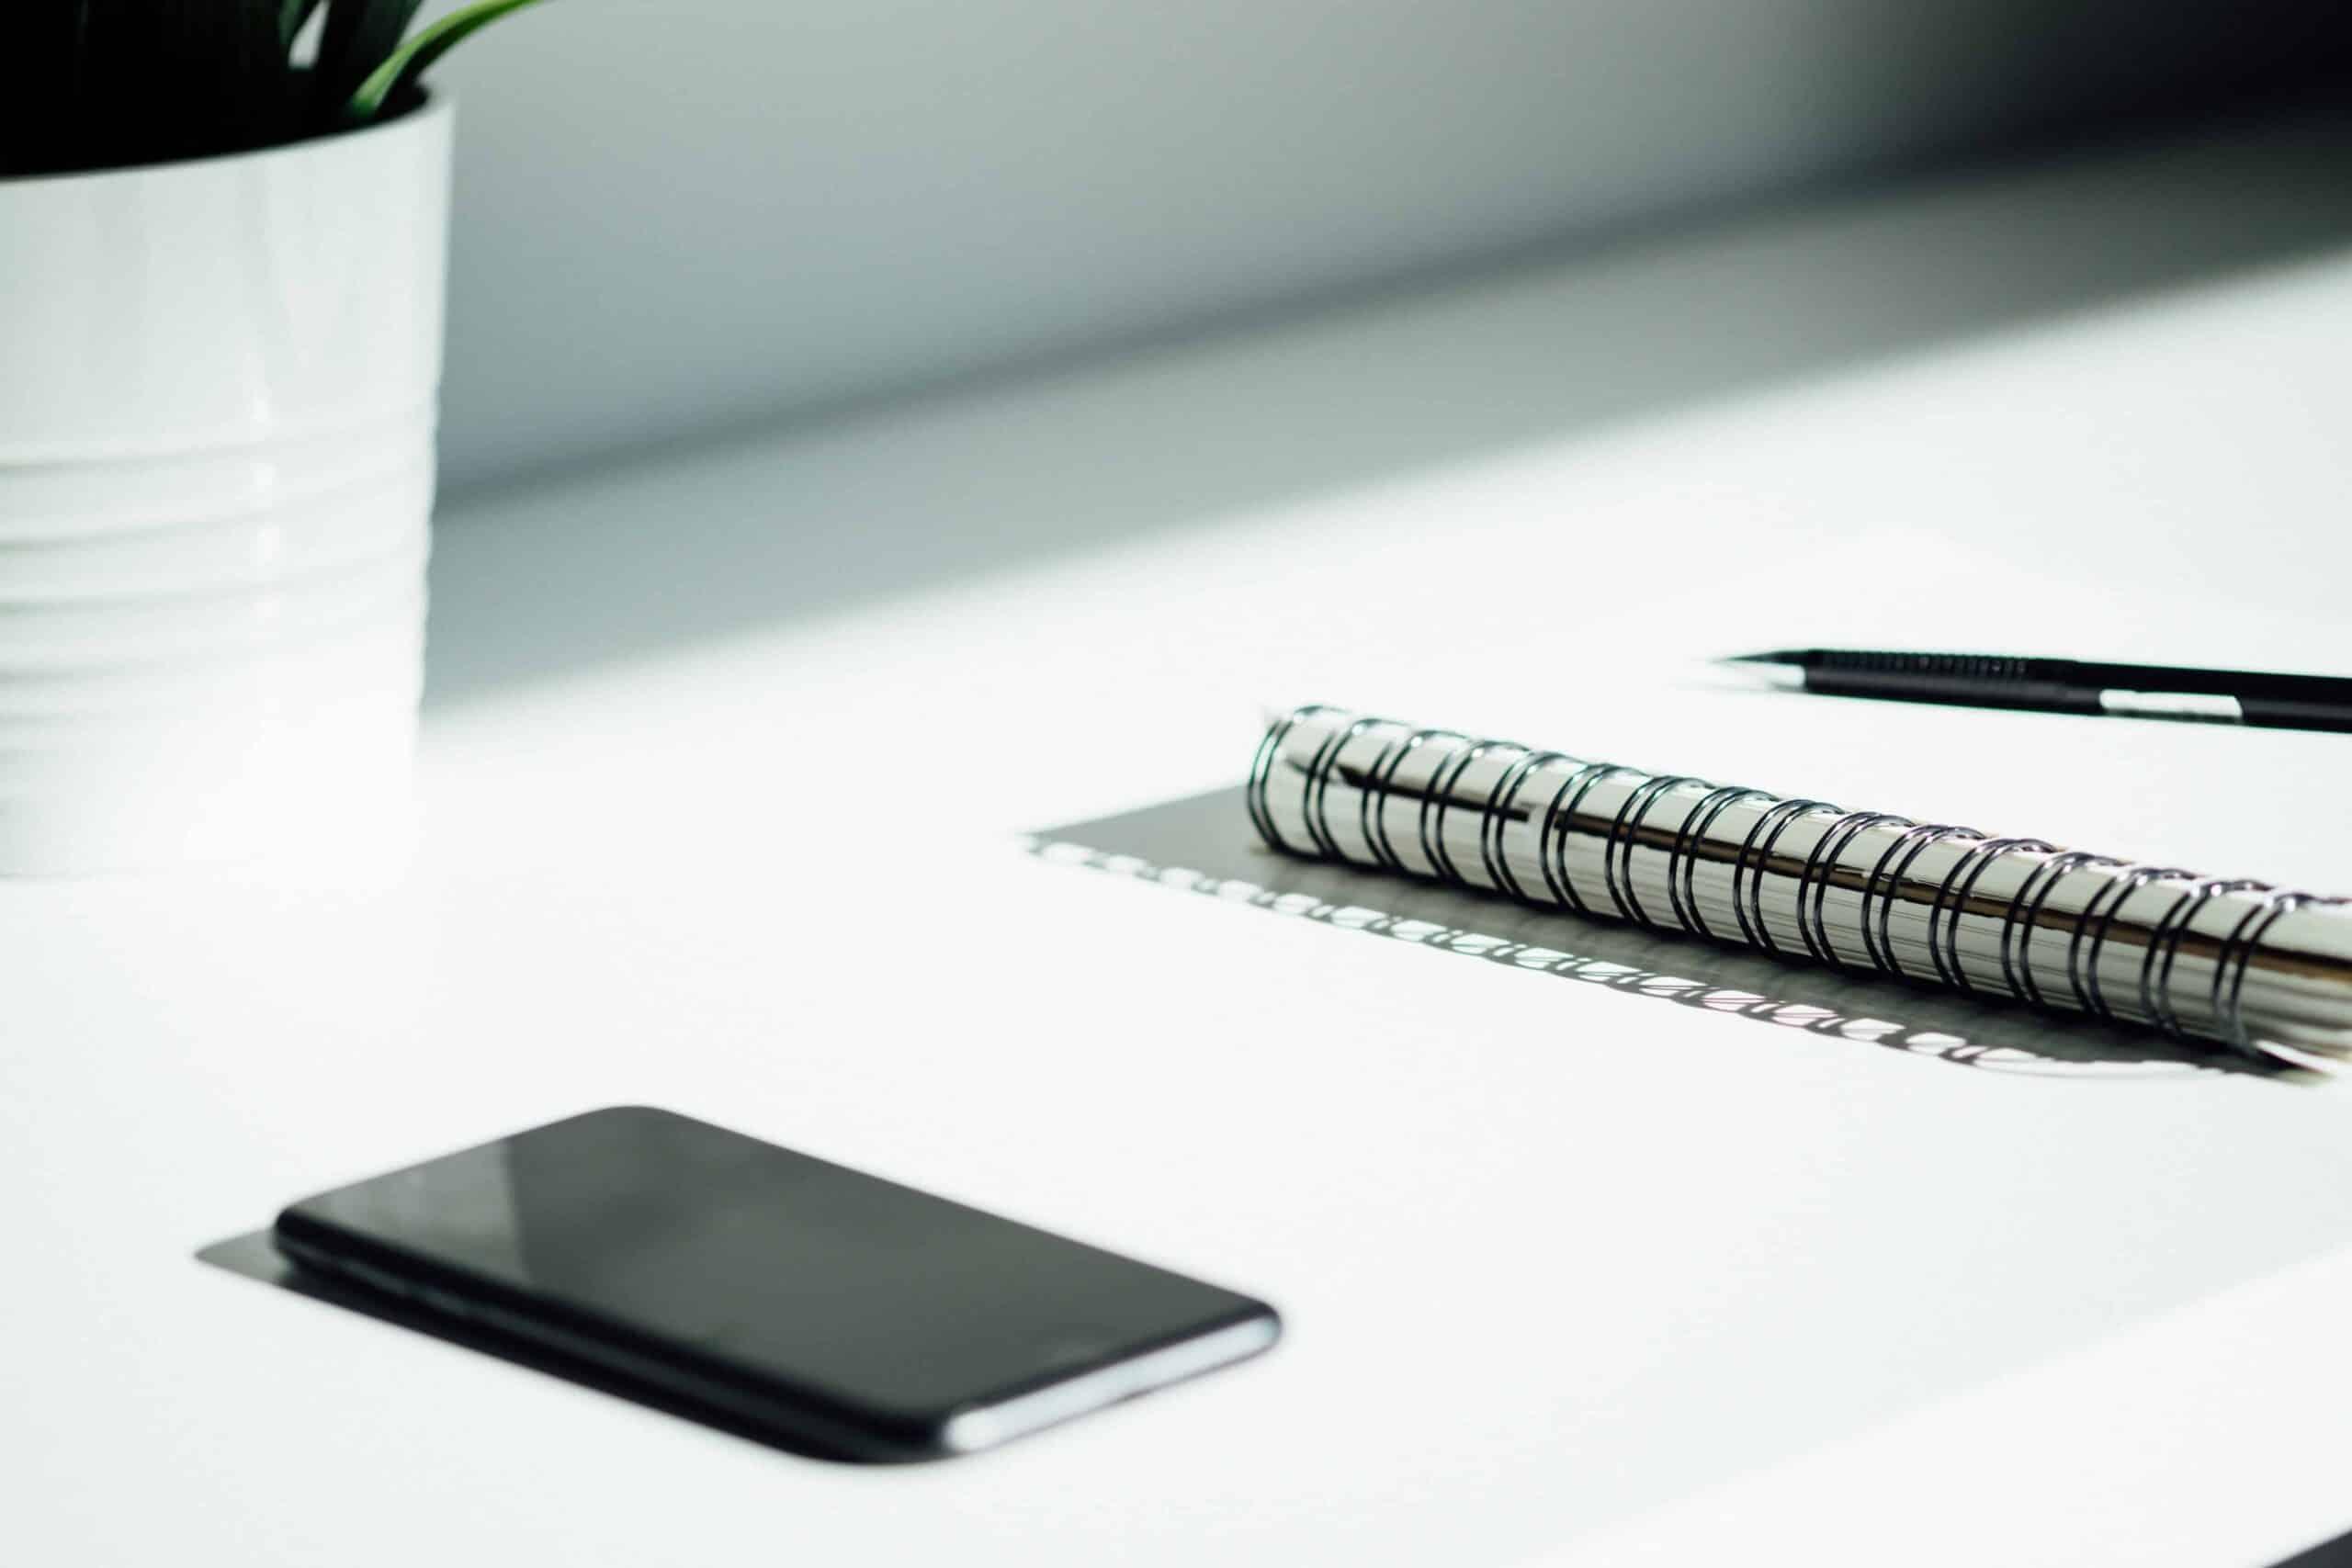 Investasi Reksadana untuk Pemula: Ini Tipsnya